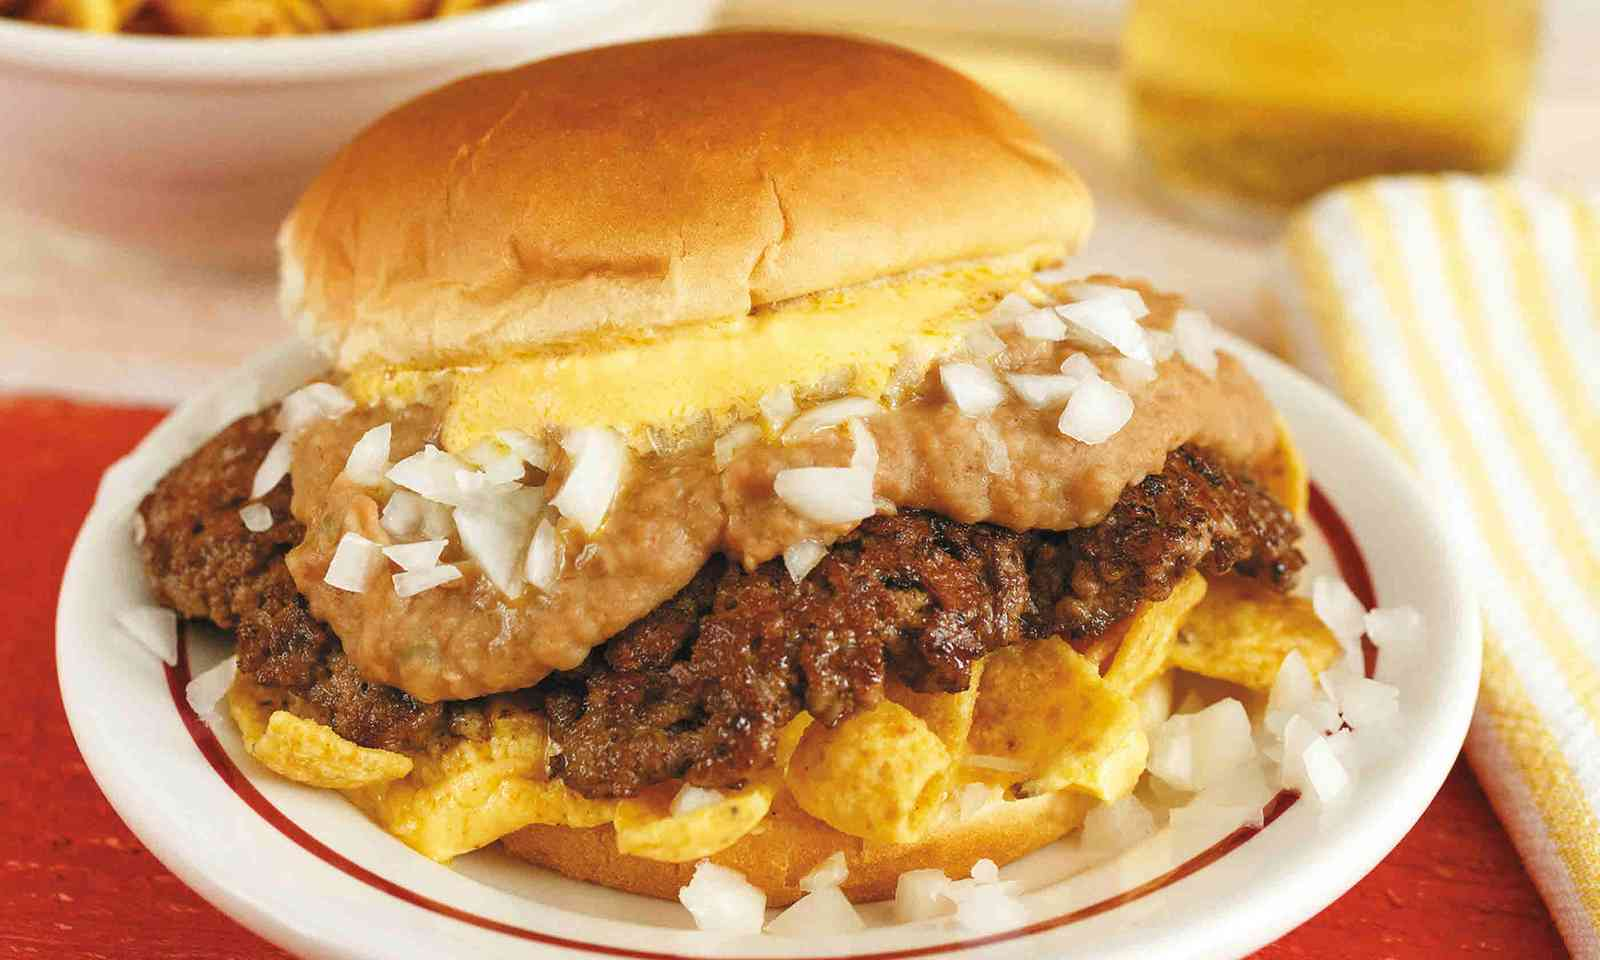 The San Antonio Beanburger